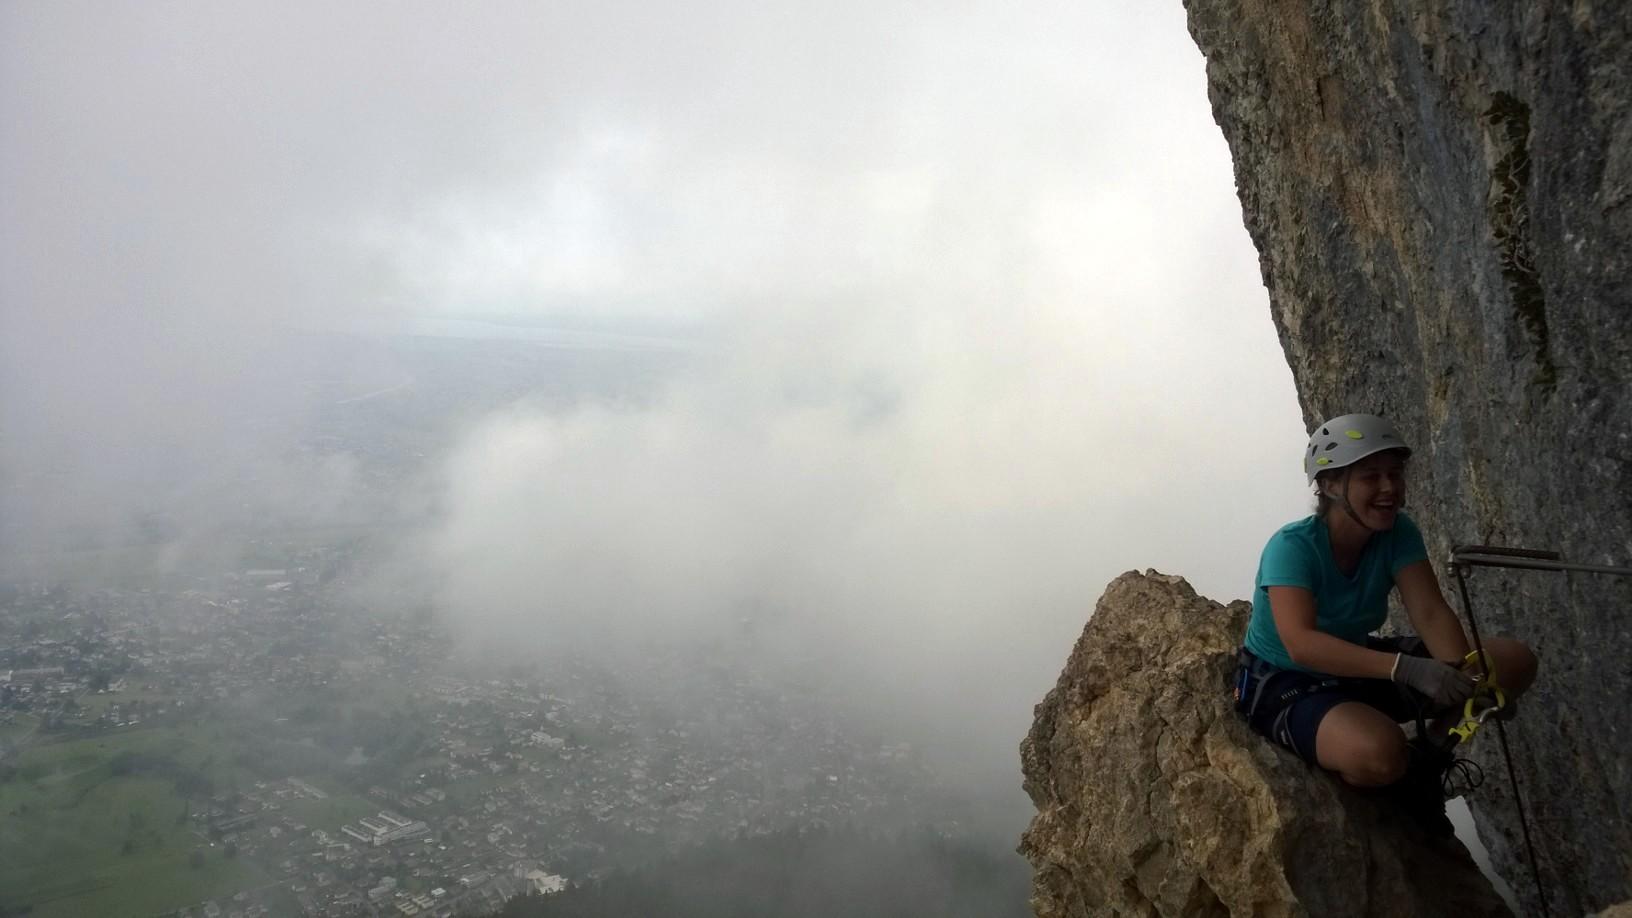 Via Kessi Klettersteig : Via kapf klettersteigen kurz und knackig d e patruckel